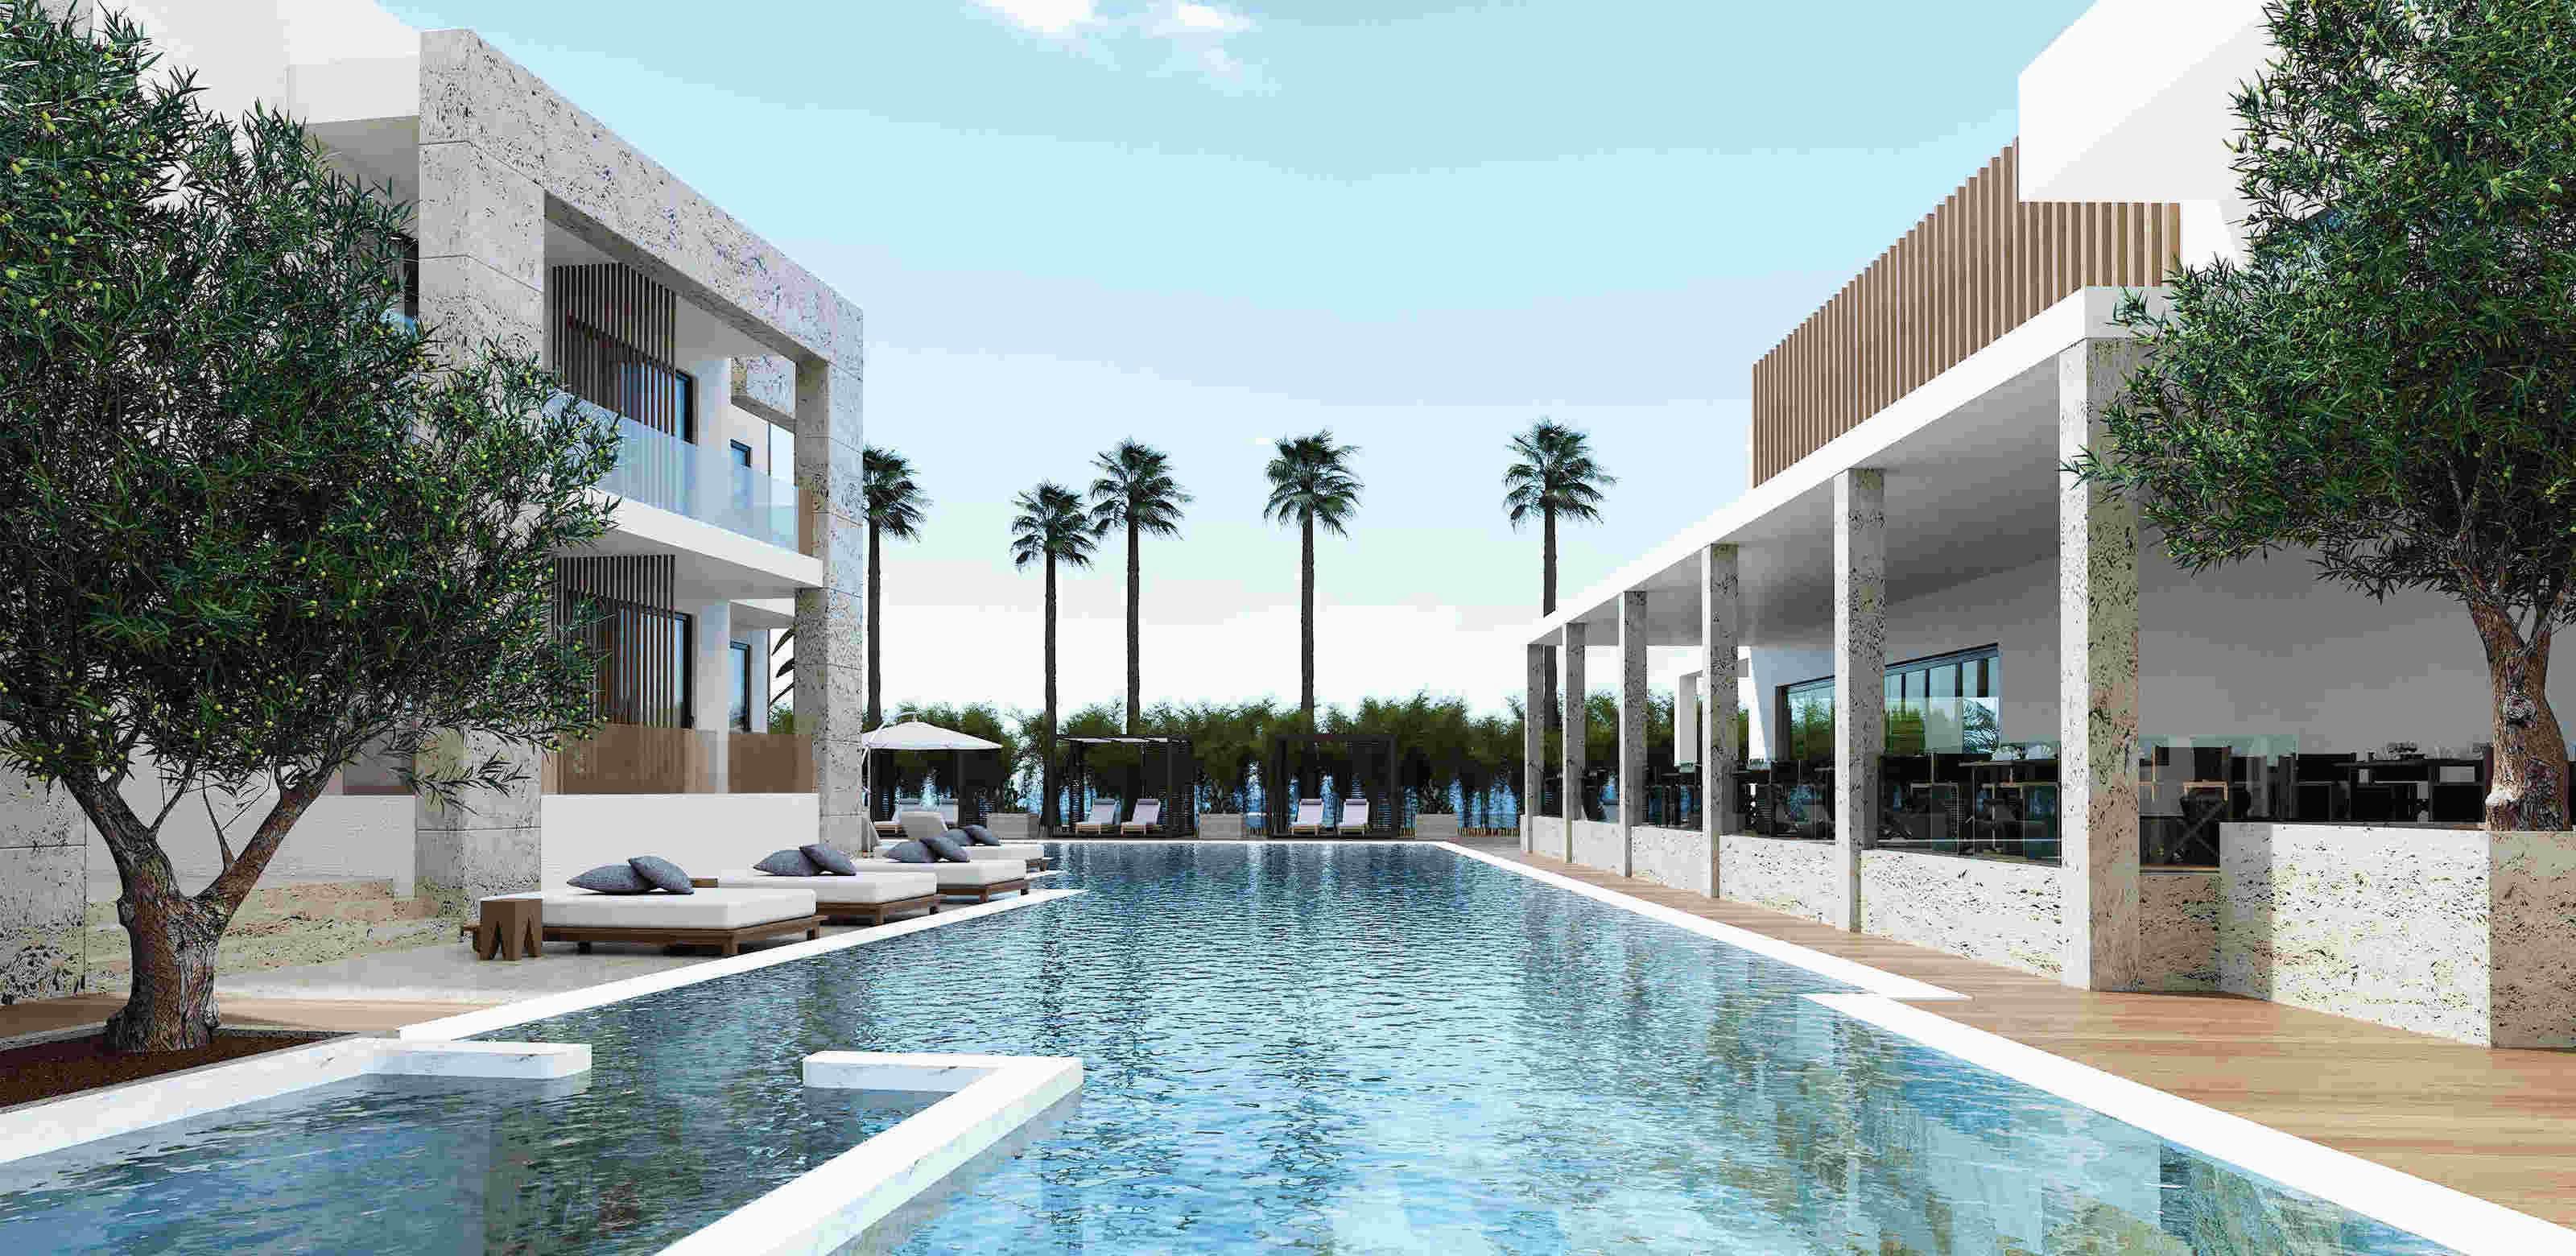 holmes place | lango design hotel poolside